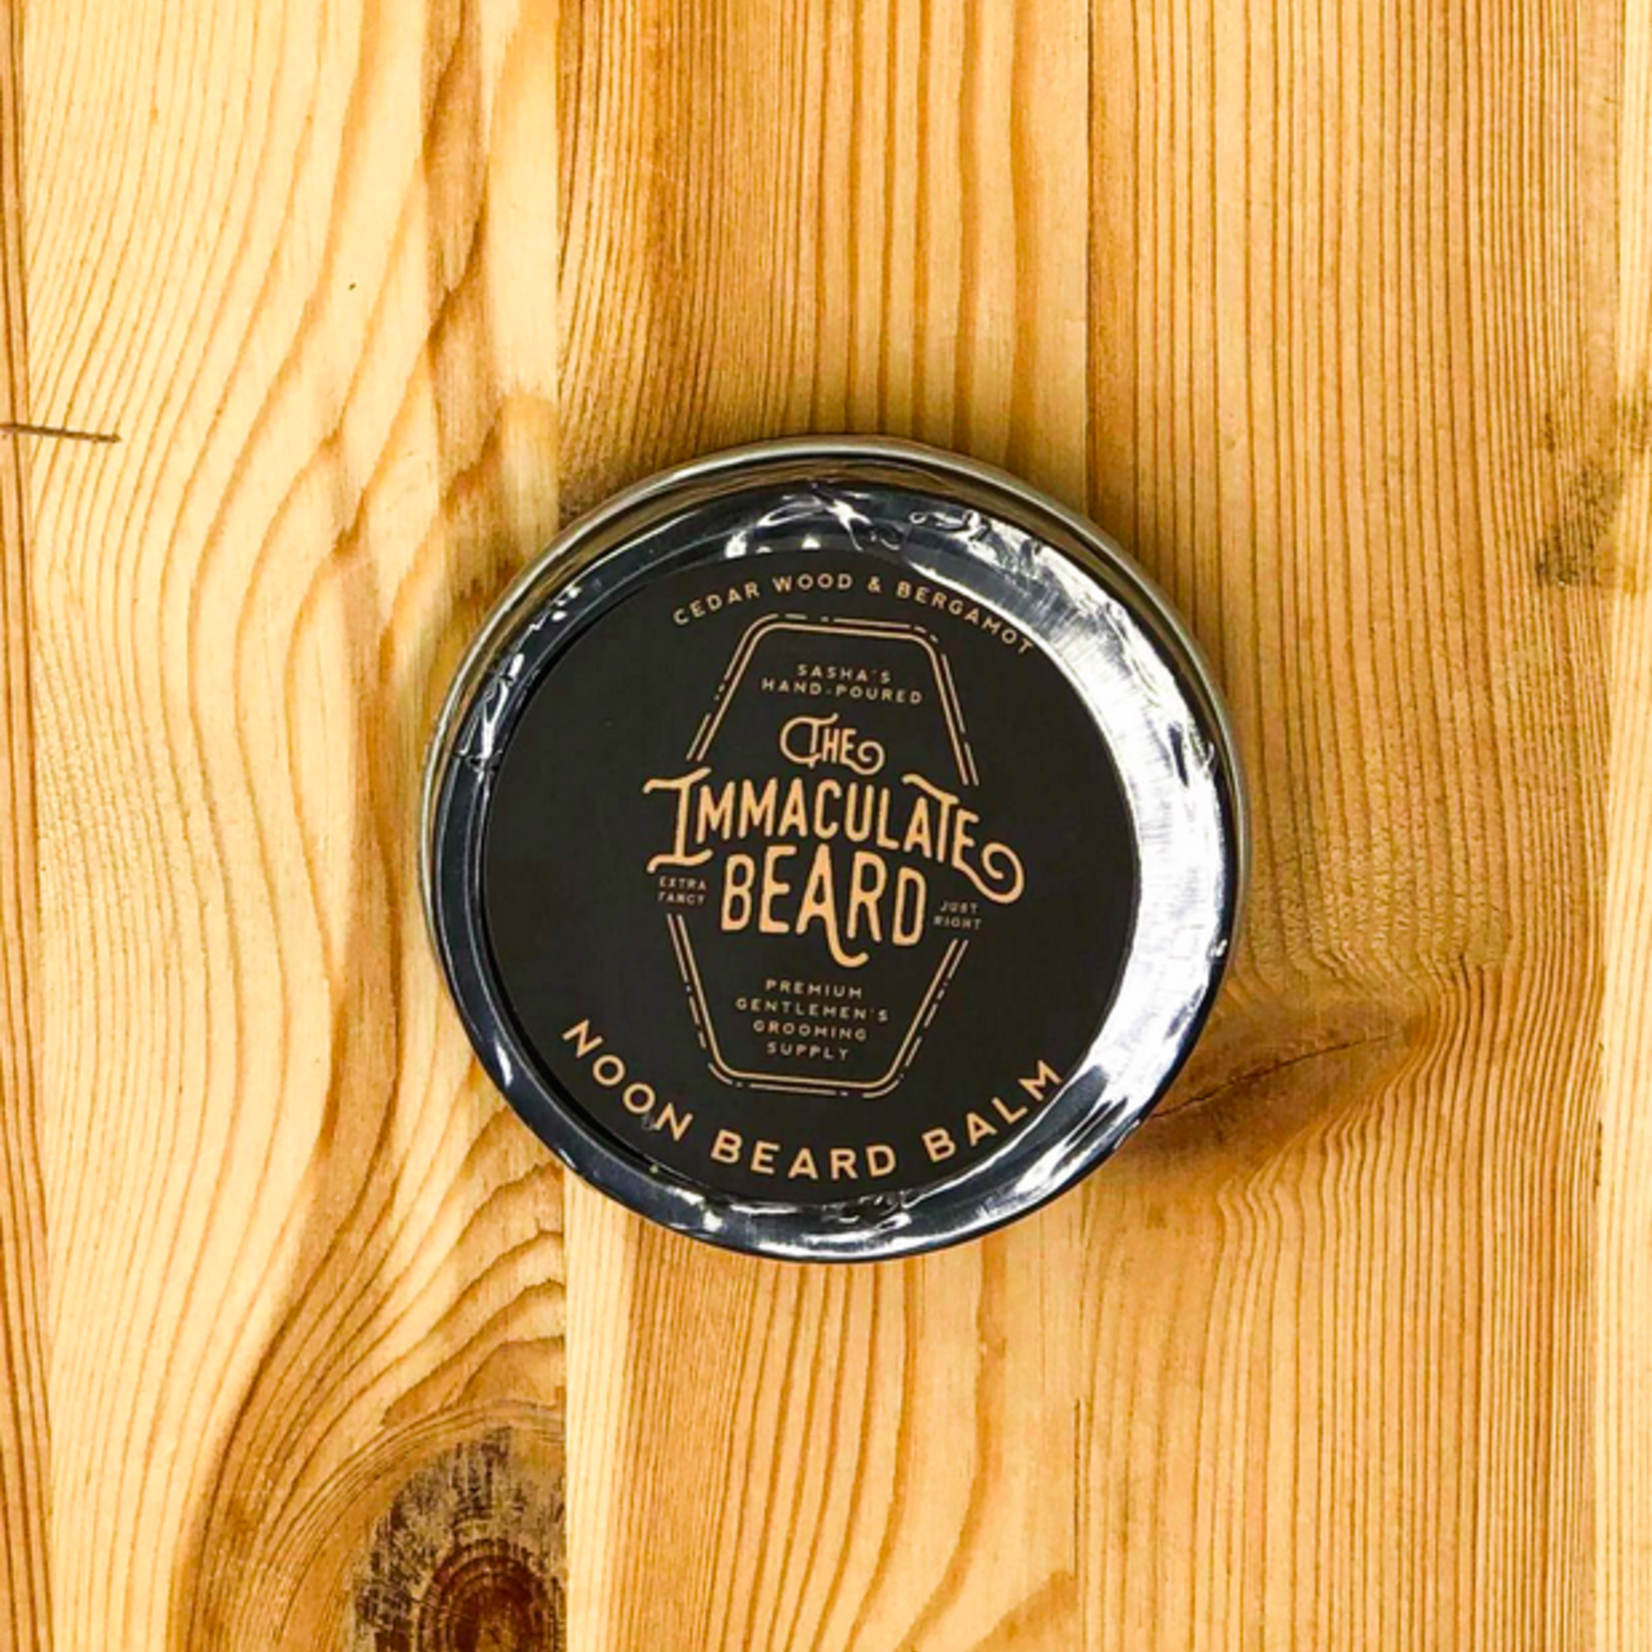 Noon: Cedarwood + Bergamot Beard Balm